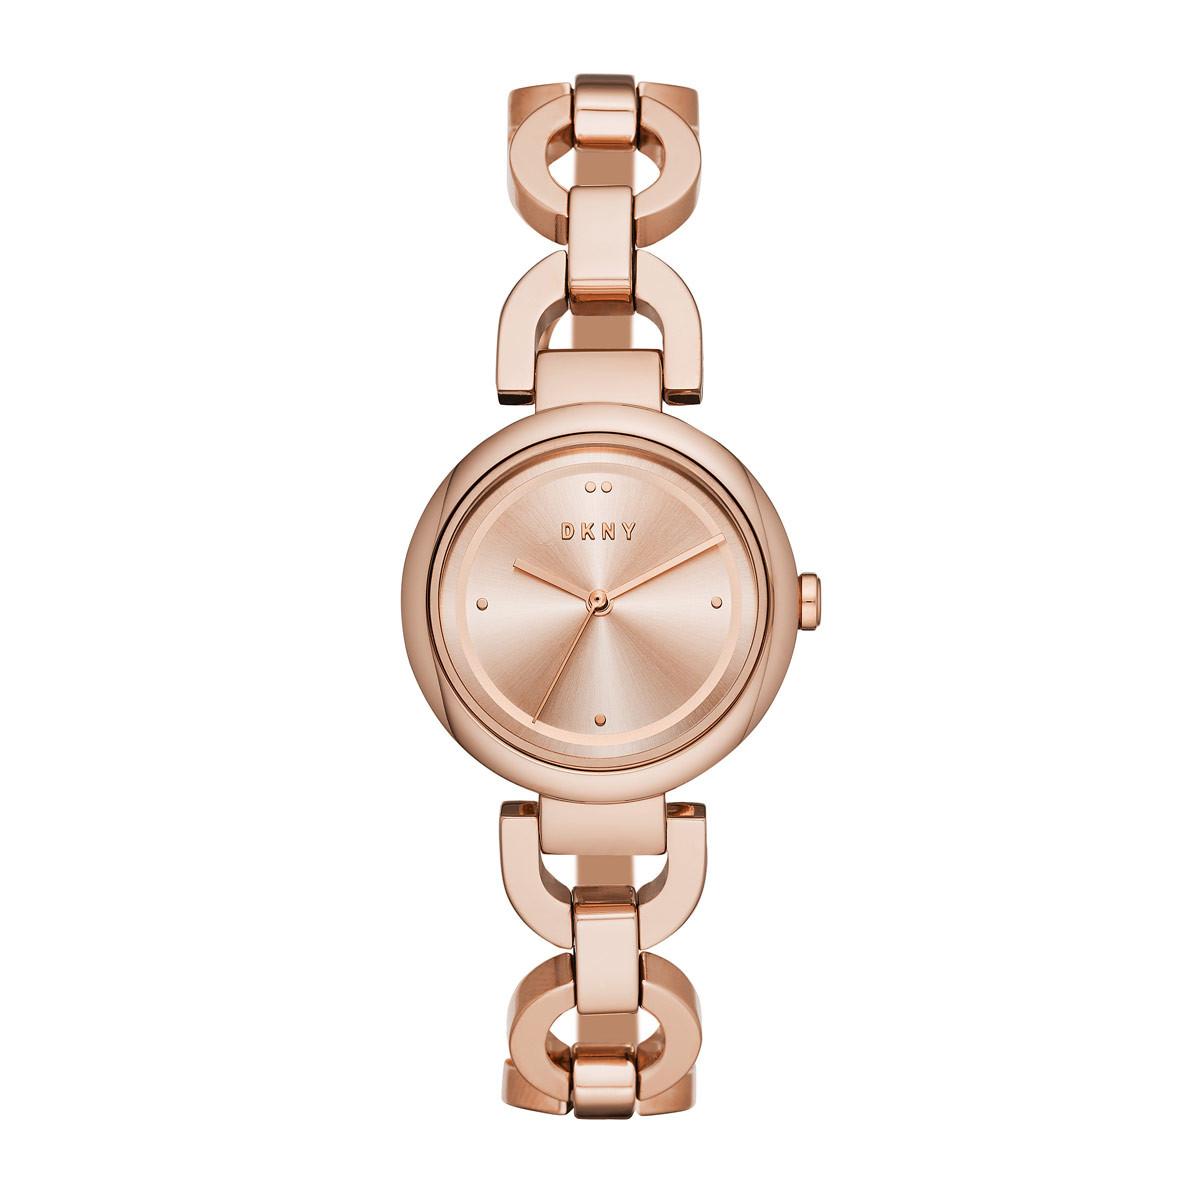 DKNY Uhr - NY2769 Eastside Watch Roségold - in gold - für Damen